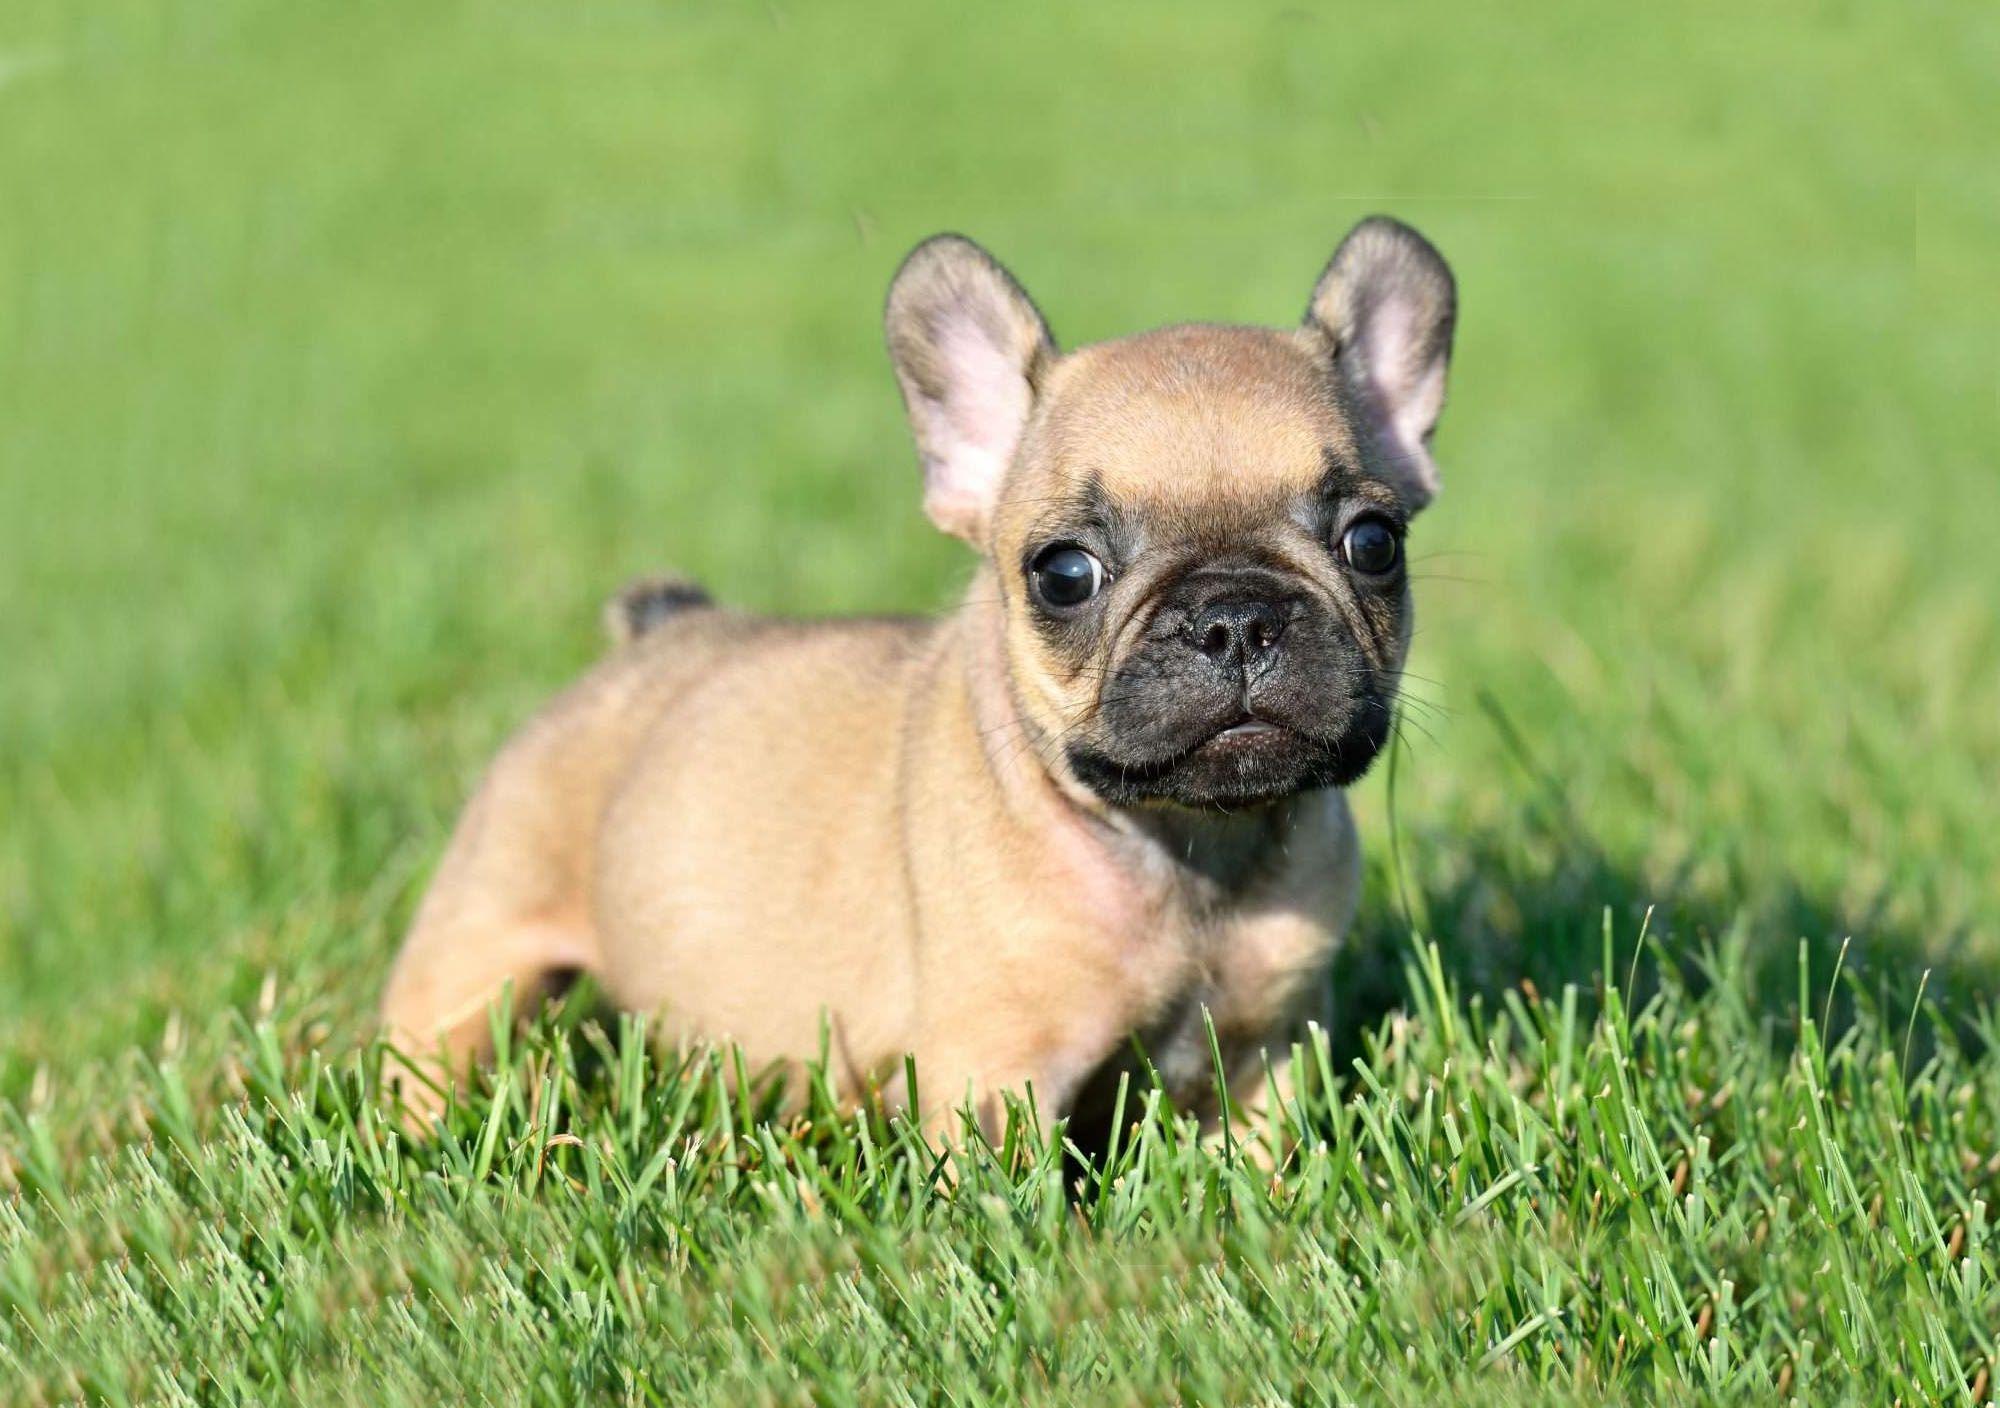 Venta de bulldog frances Bulldog francés, Bulldogs y